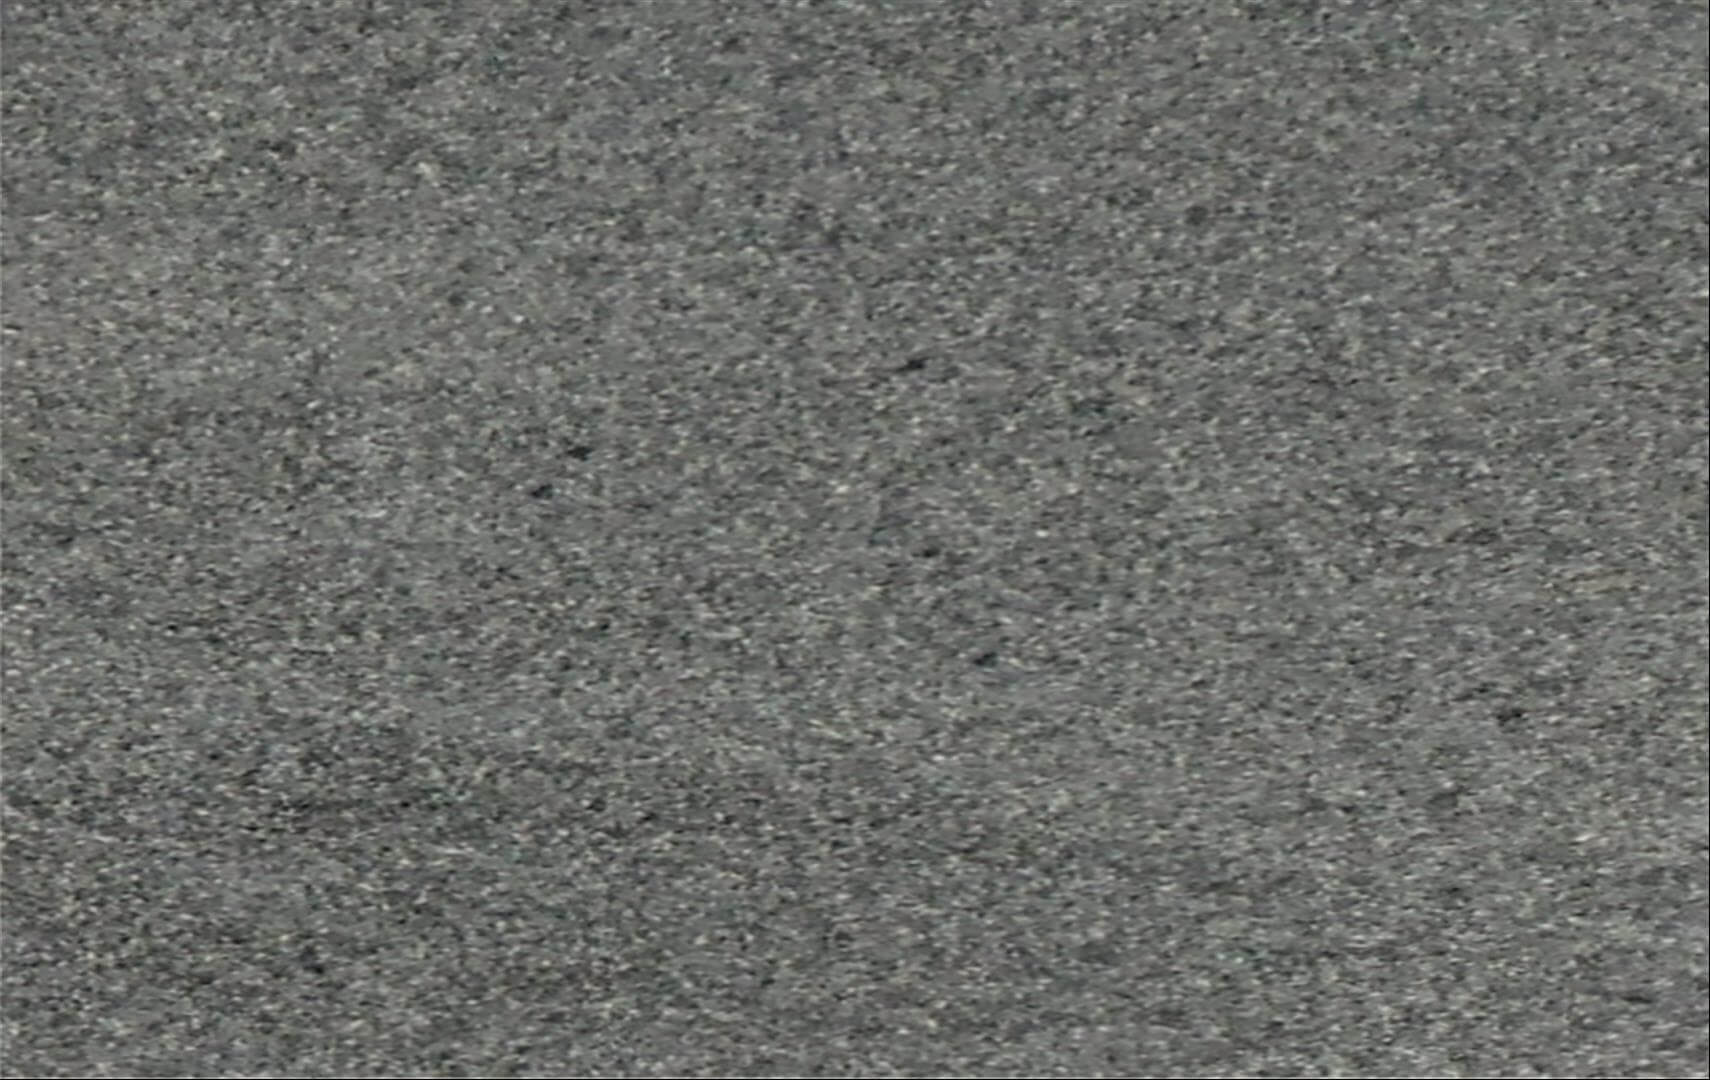 Hisar Yaylak Granite-Karye Yaylak-Sivrihisar Grey Granite